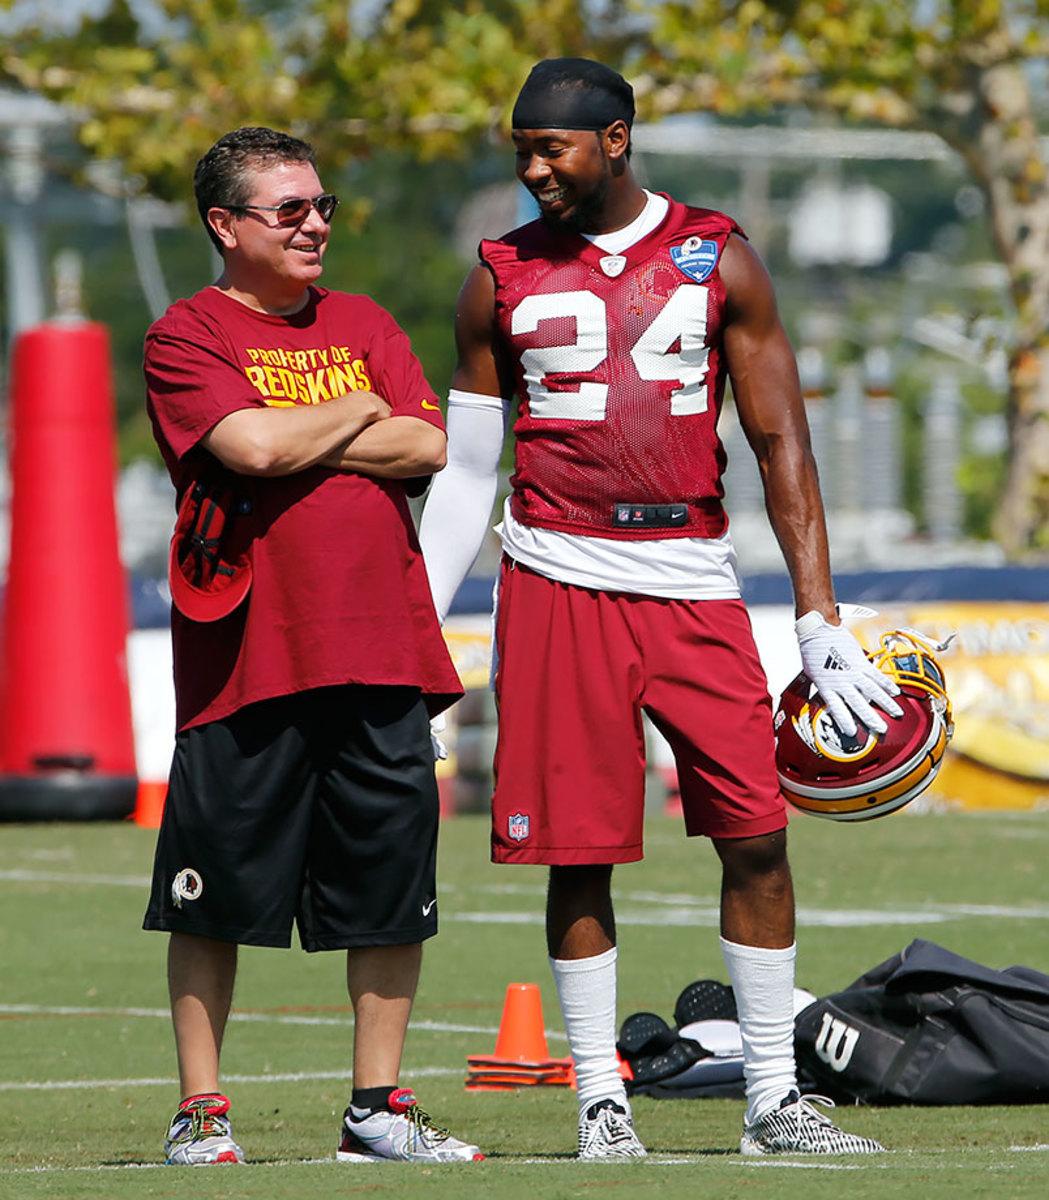 2016-0729-Washington-Redskins-training-camp-Josh-Norman-Dan-Snyder.jpg